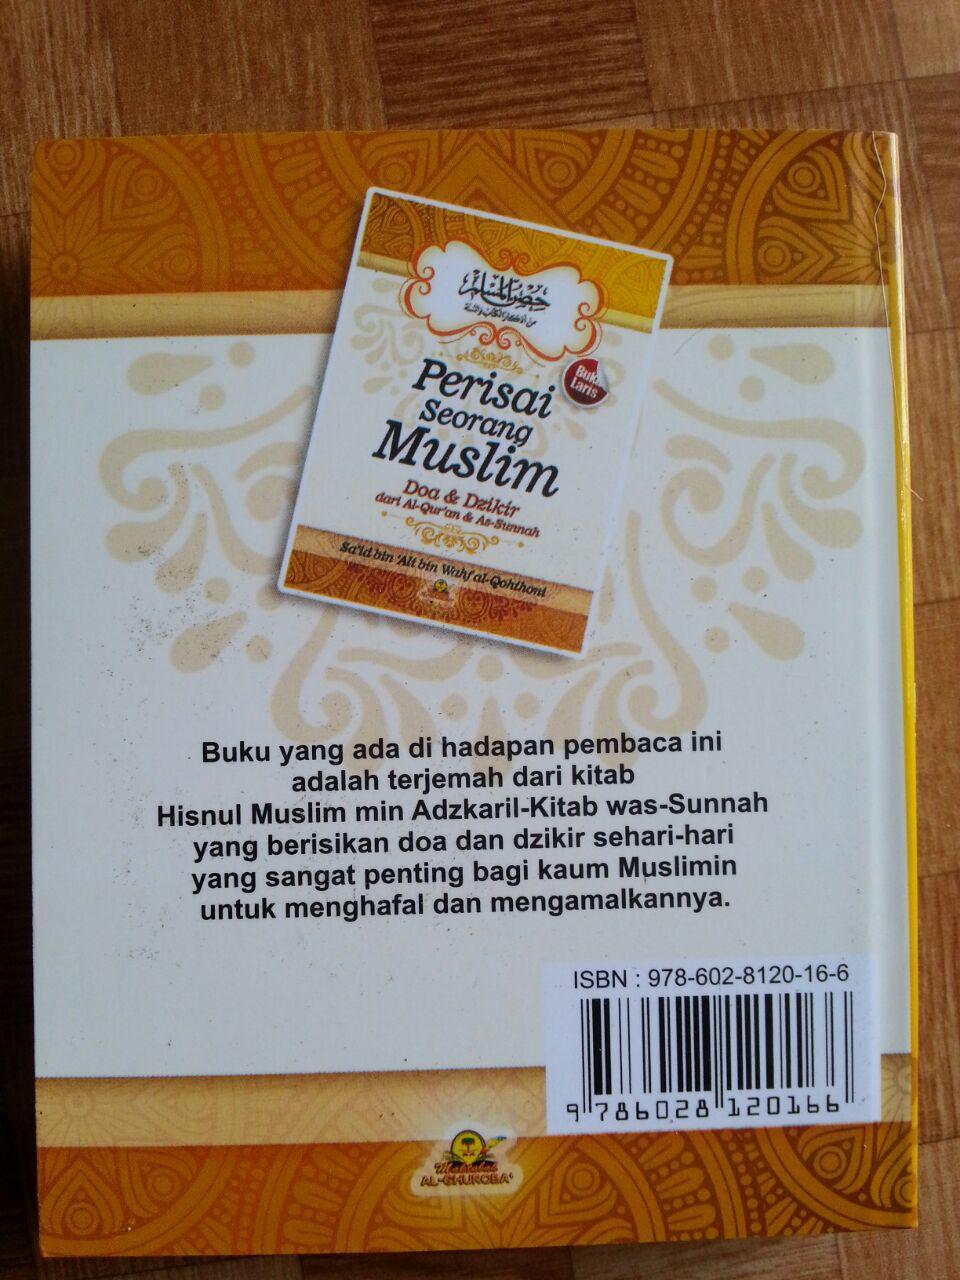 Buku Saku Perisai Seorang Muslim cover